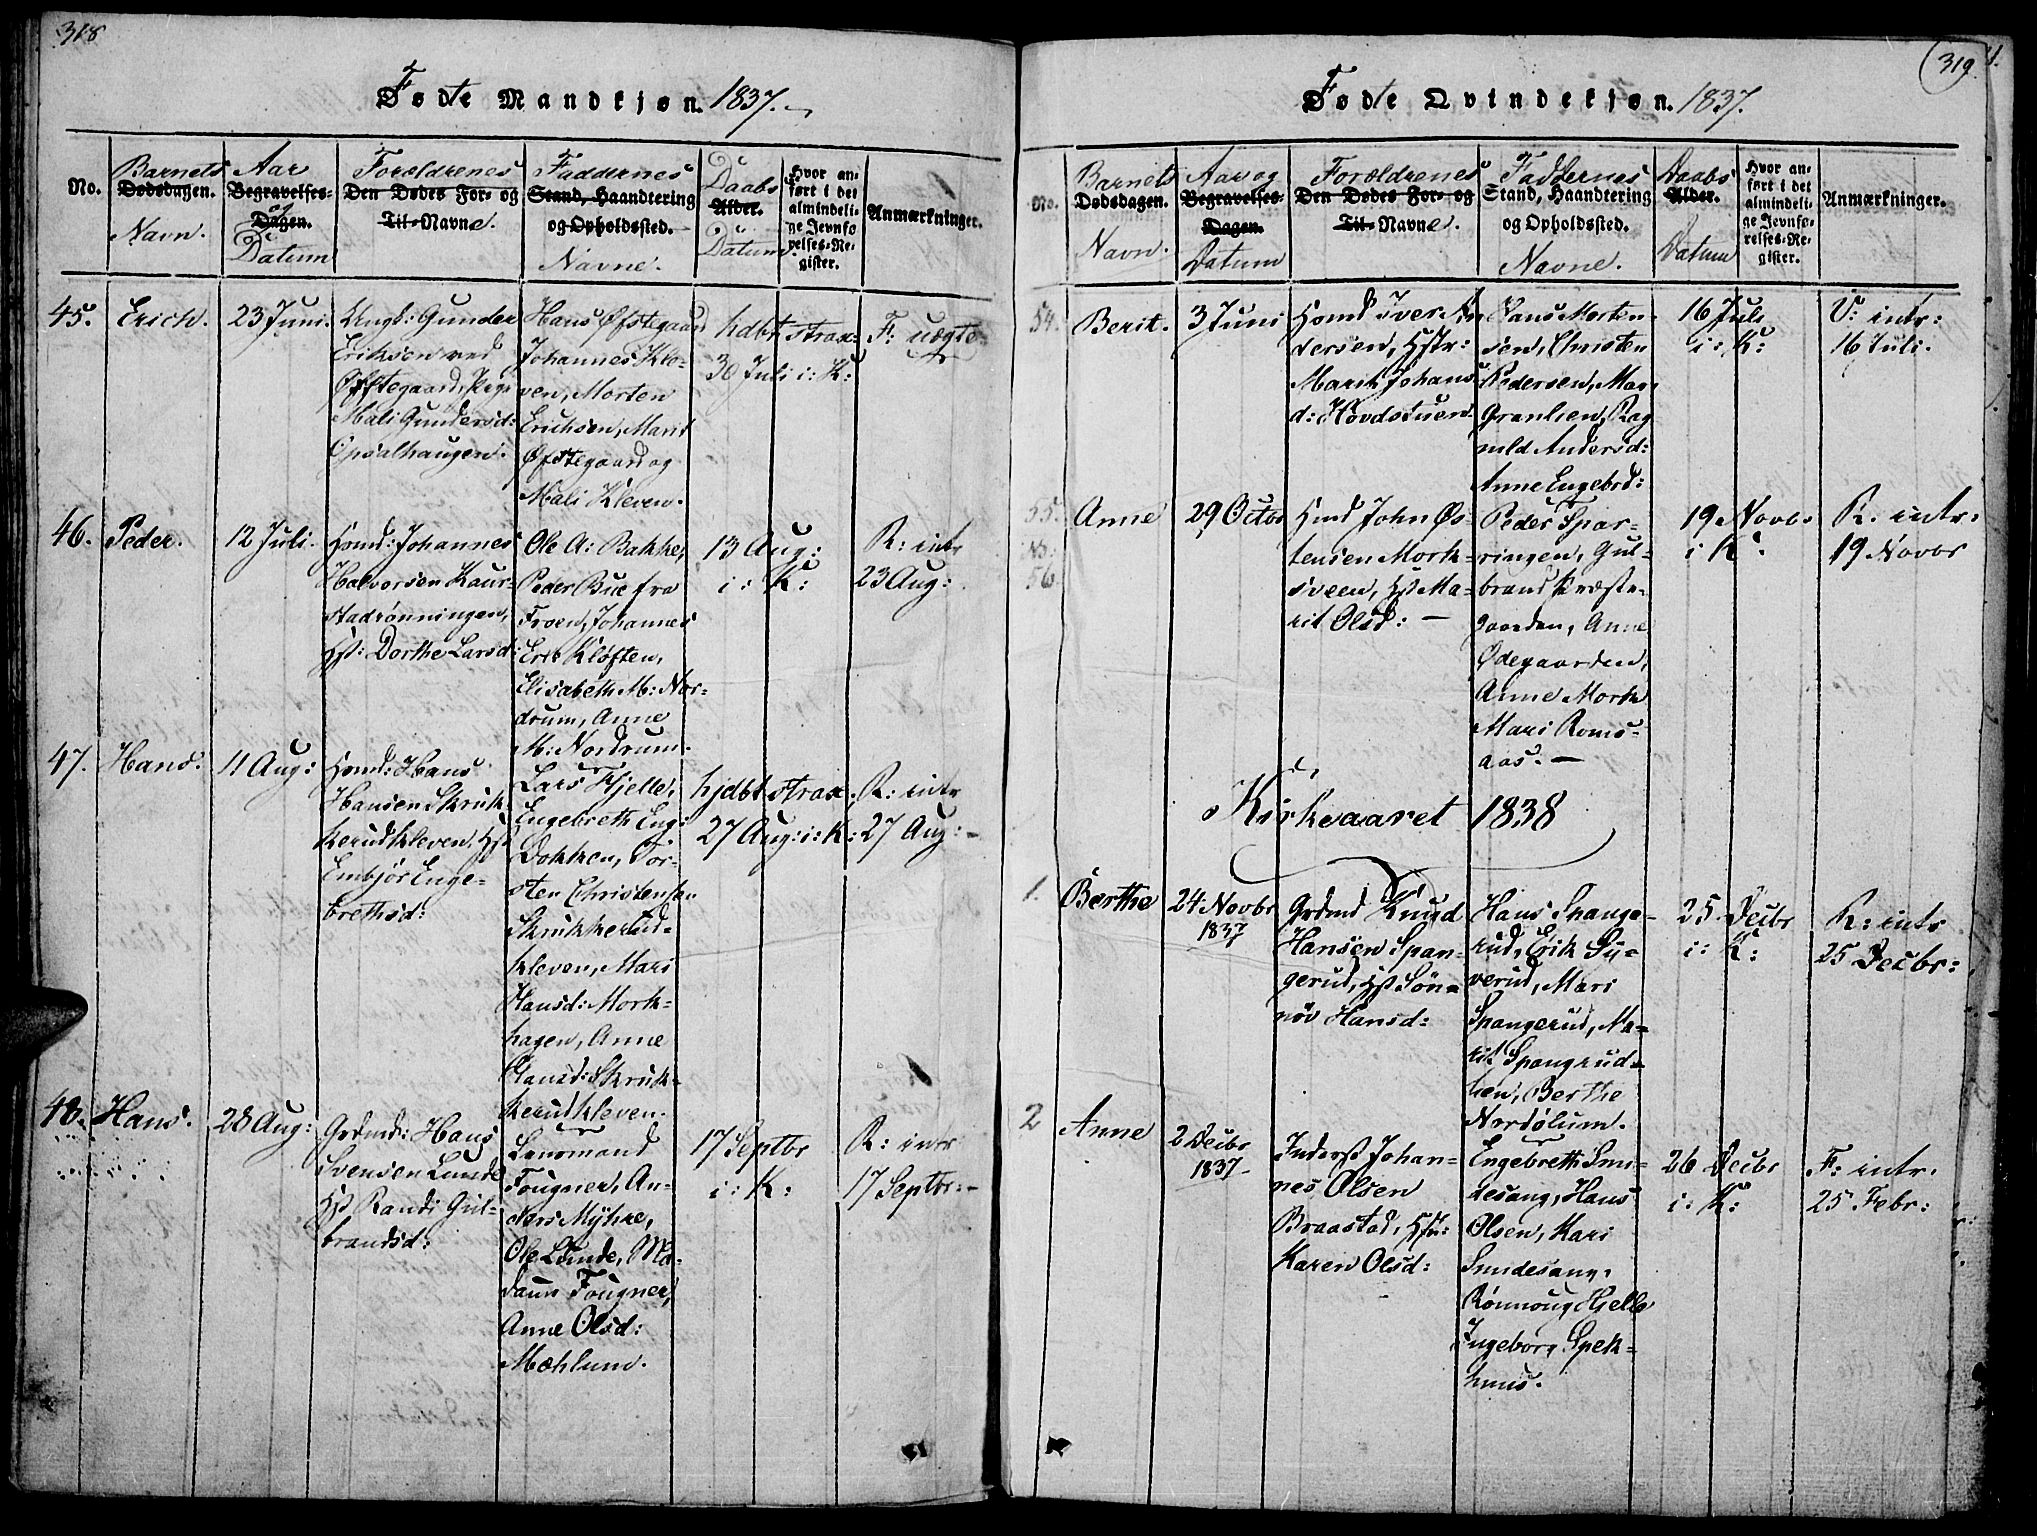 SAH, Ringebu prestekontor, Ministerialbok nr. 4, 1821-1839, s. 318-319